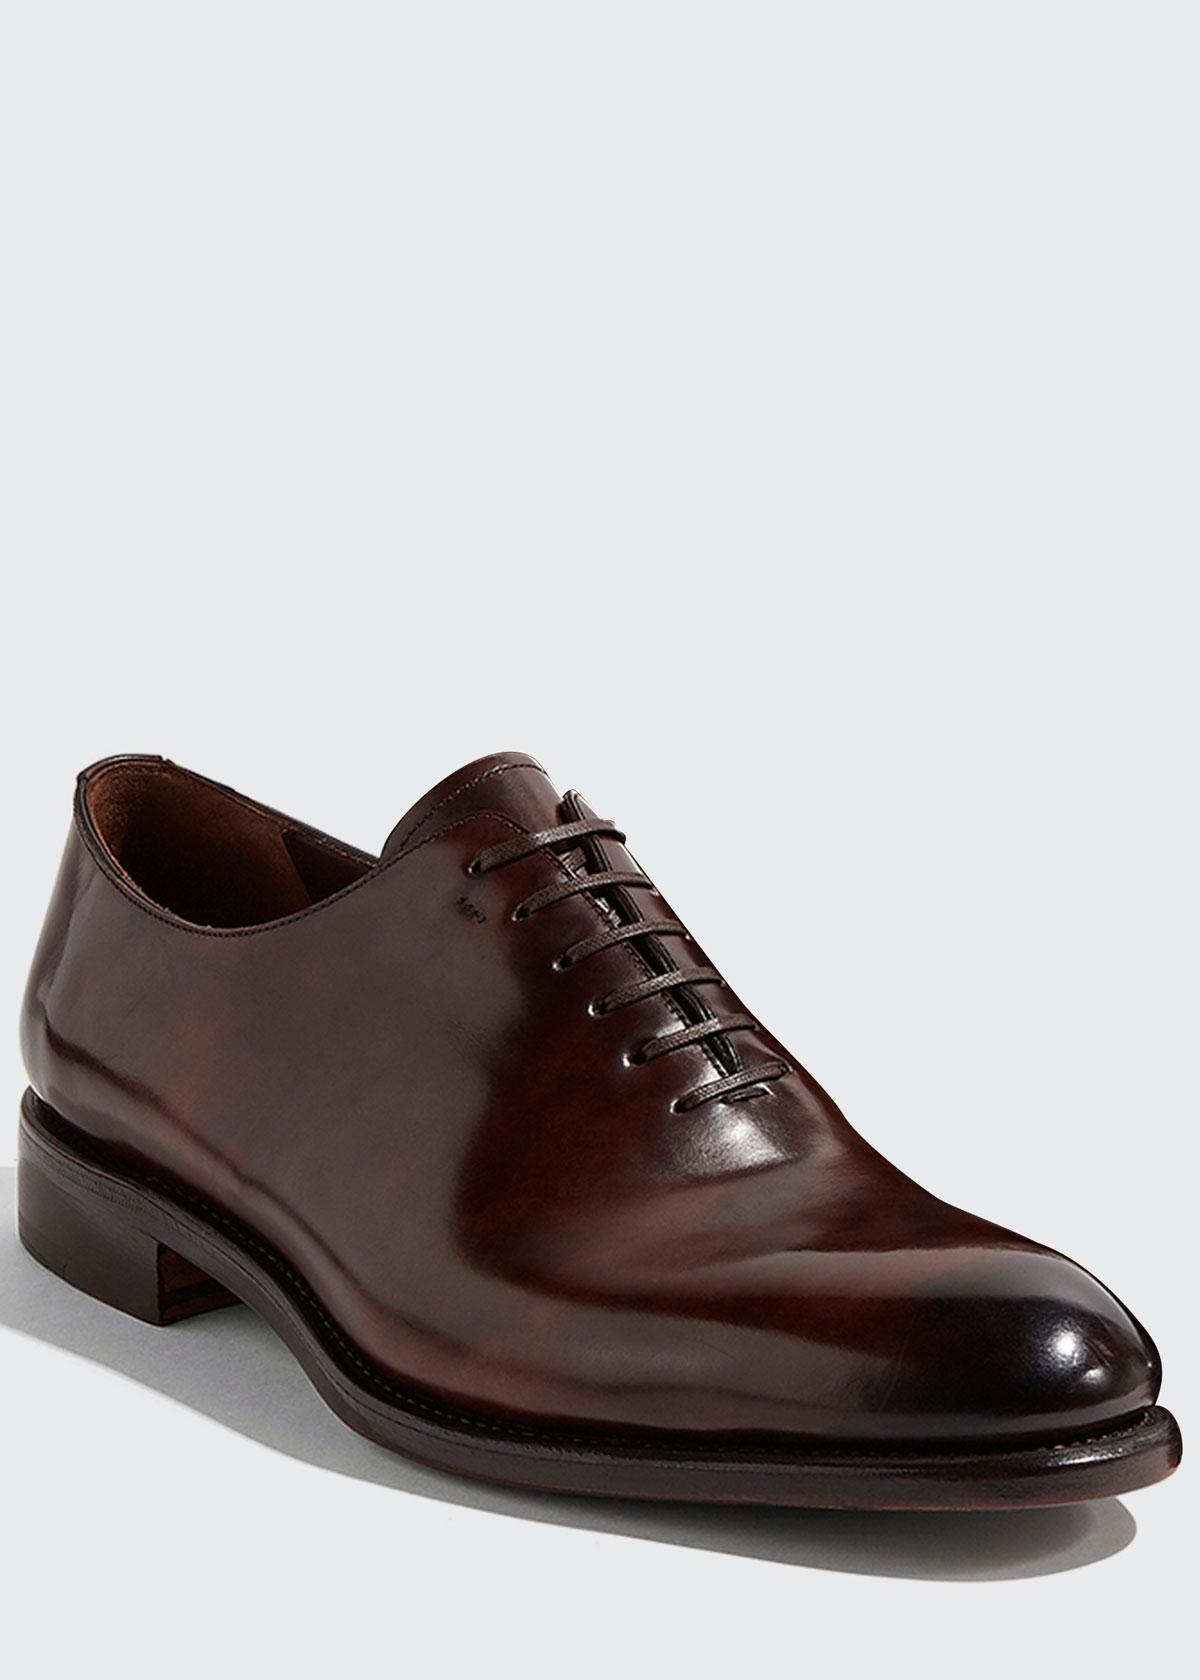 Salvatore Ferragamo Men's Angiolo Tramezza Whole-Cut Leather Lace-Up Shoes  - AFRICA - Size: 8.5